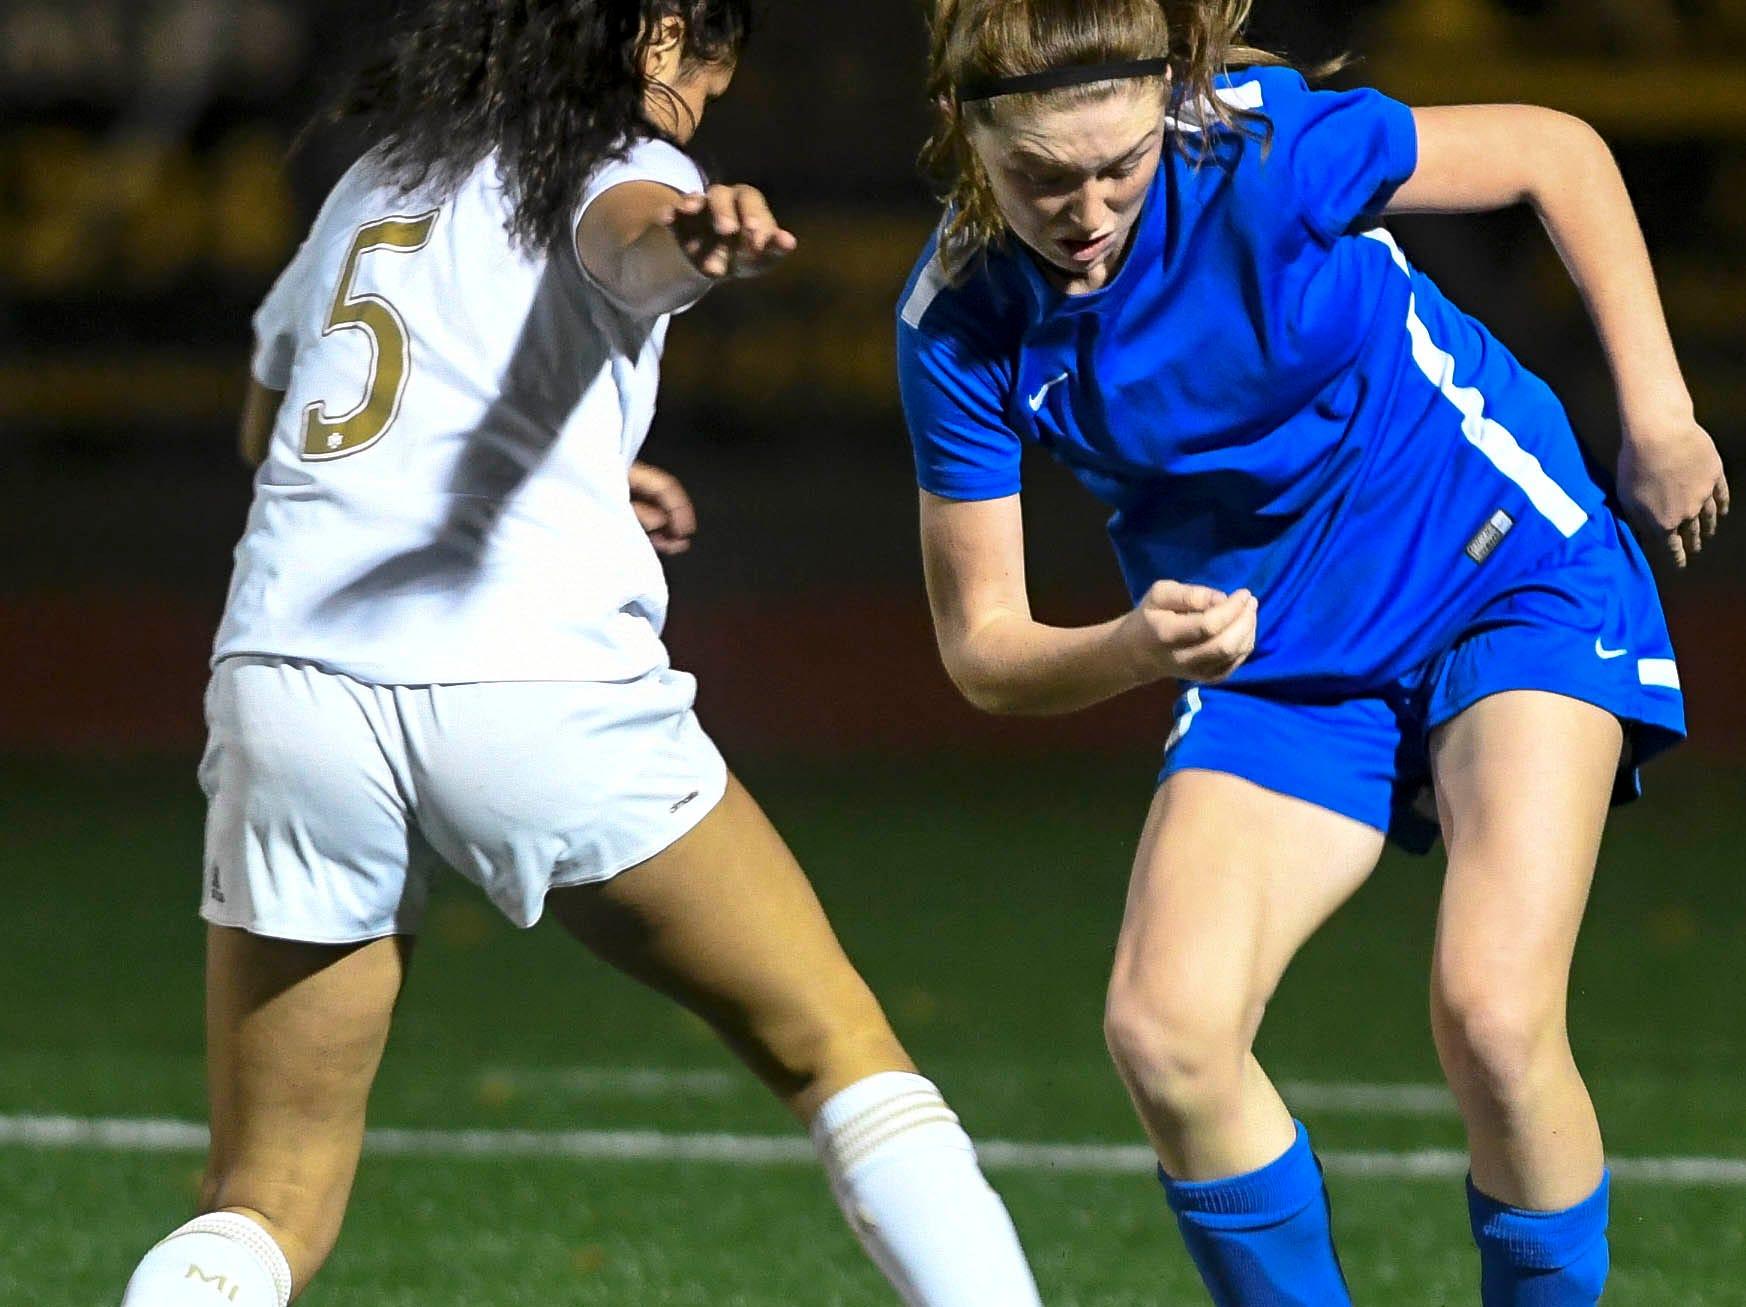 Titusville's Sarah Duschesneau redirects the ball away from Merritt Island's Amaya Quintal during Tuesday's District 12, Class 3A soccer semifinal.